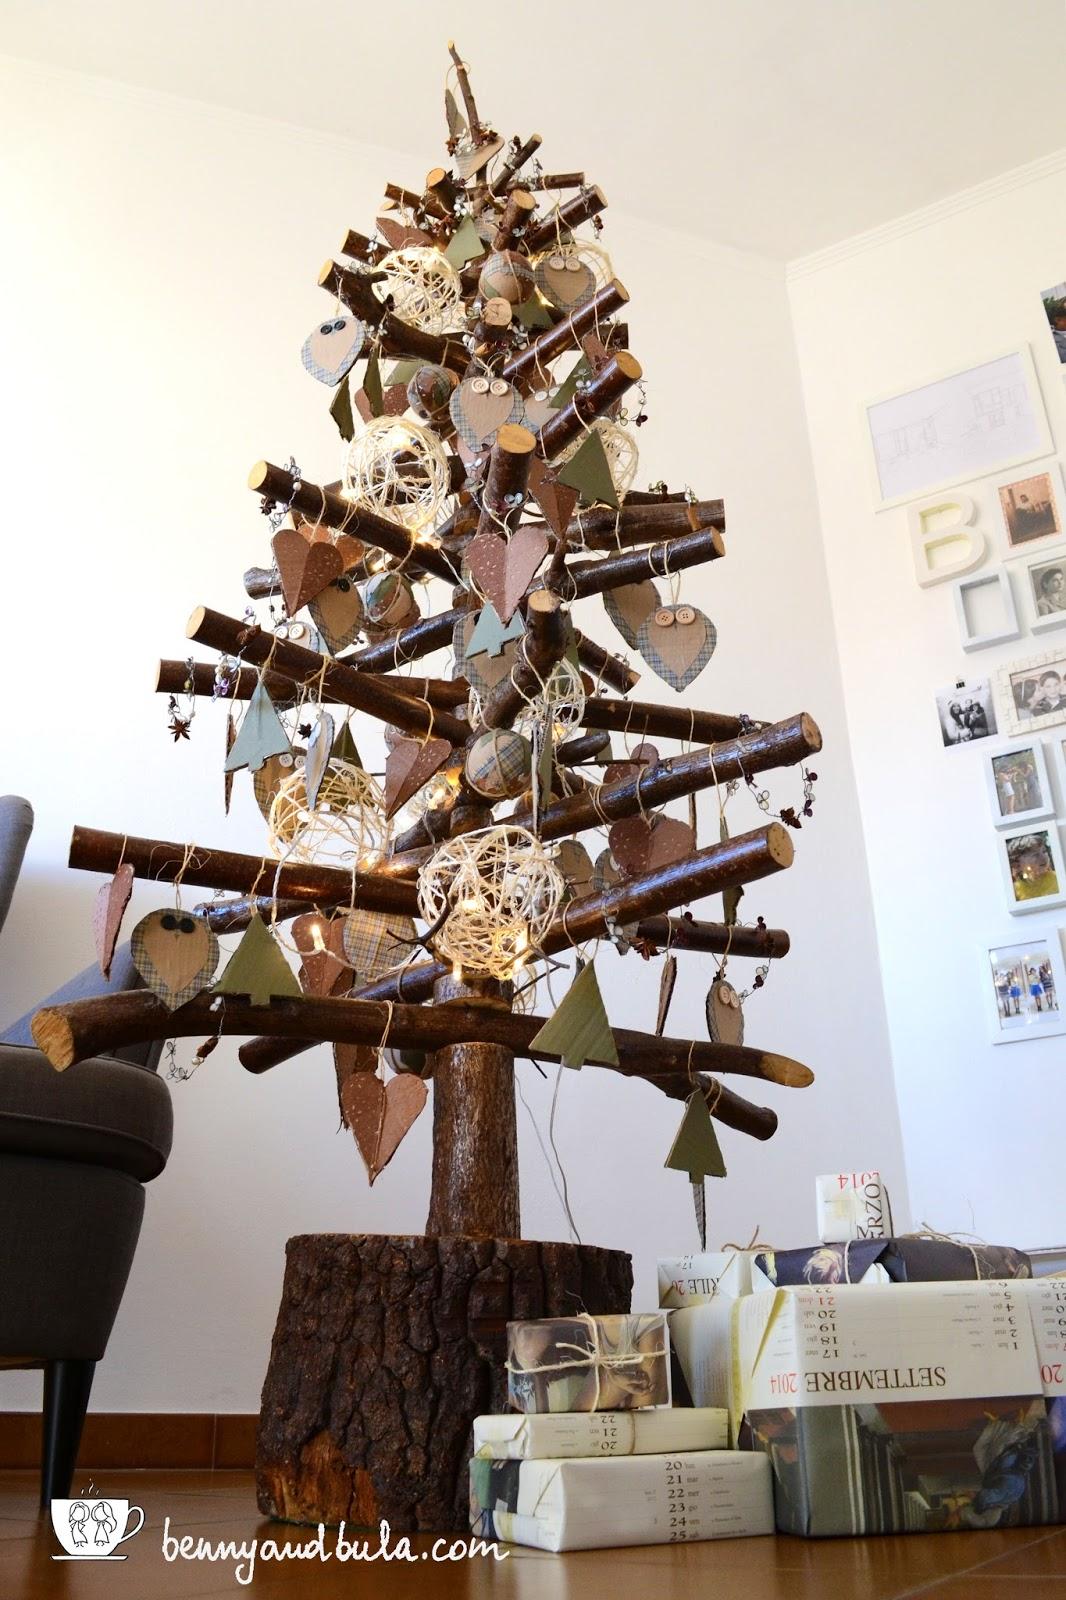 Albero di Natale in legno Faidate/DIY Scandinavian Christmas Tree with Branches